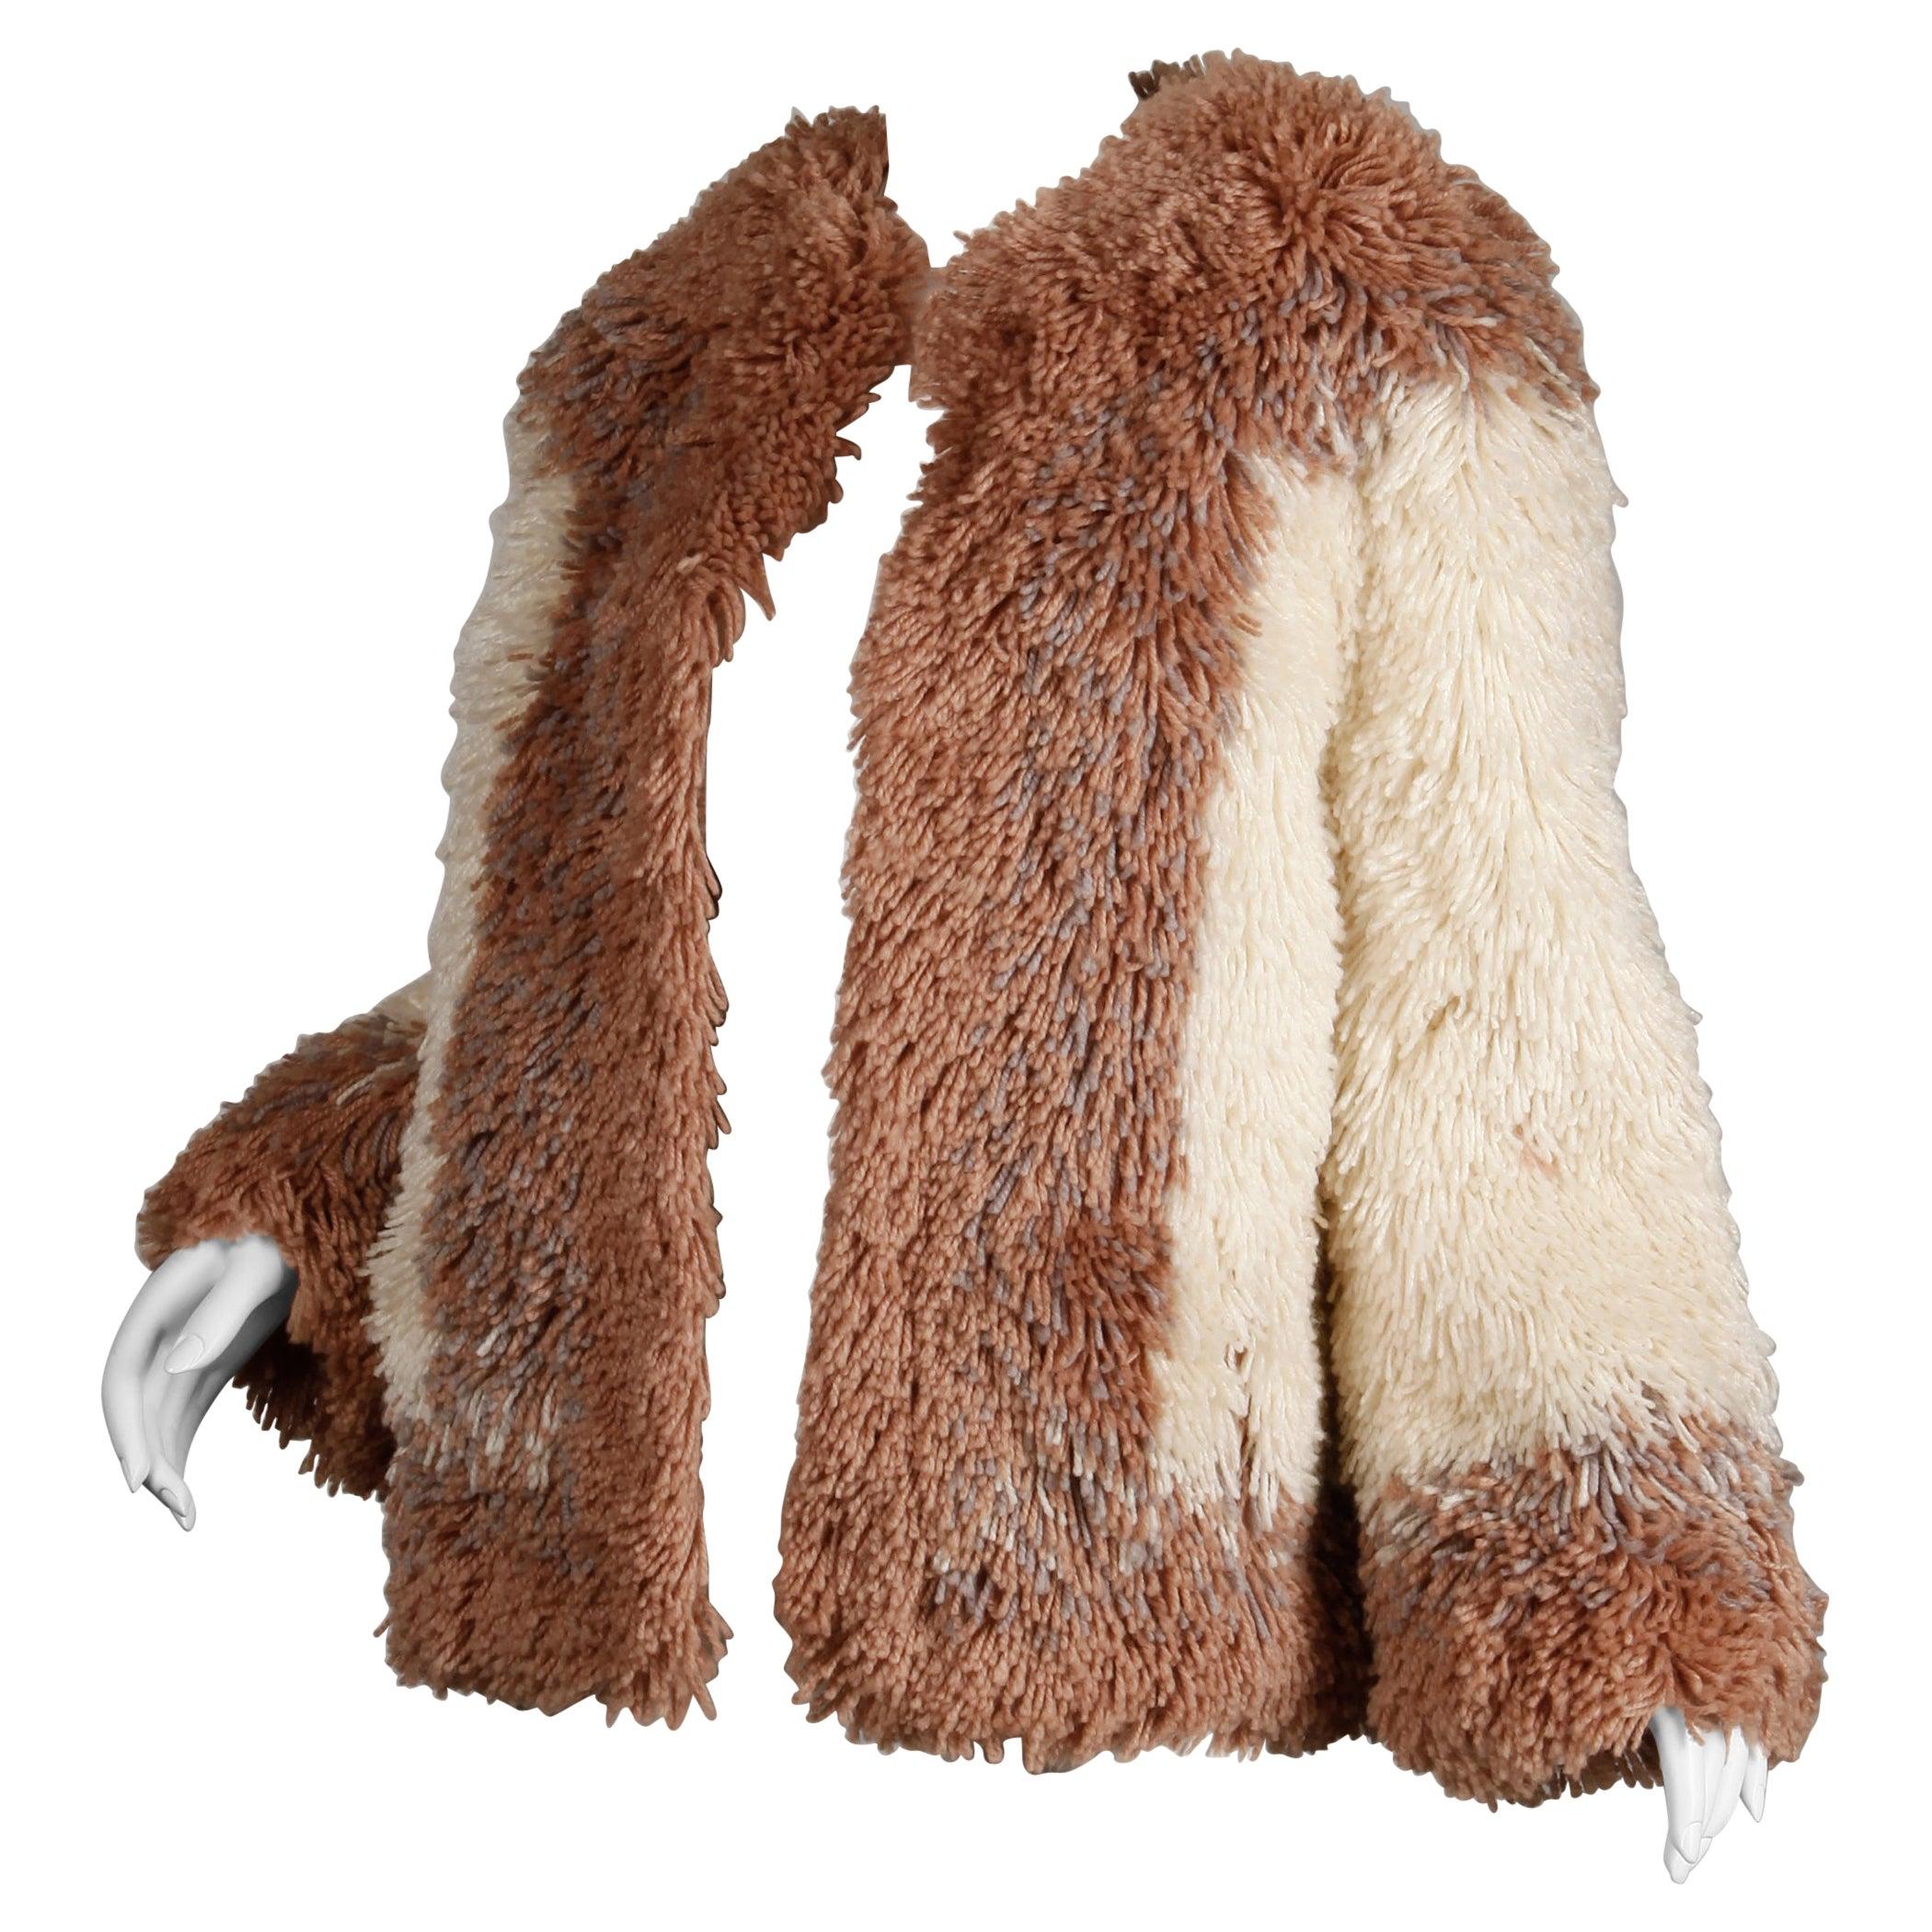 Judith Ann Vintage Heavy + Warm Wool Shaggy Faux Fur Jacket or Coat 1980s